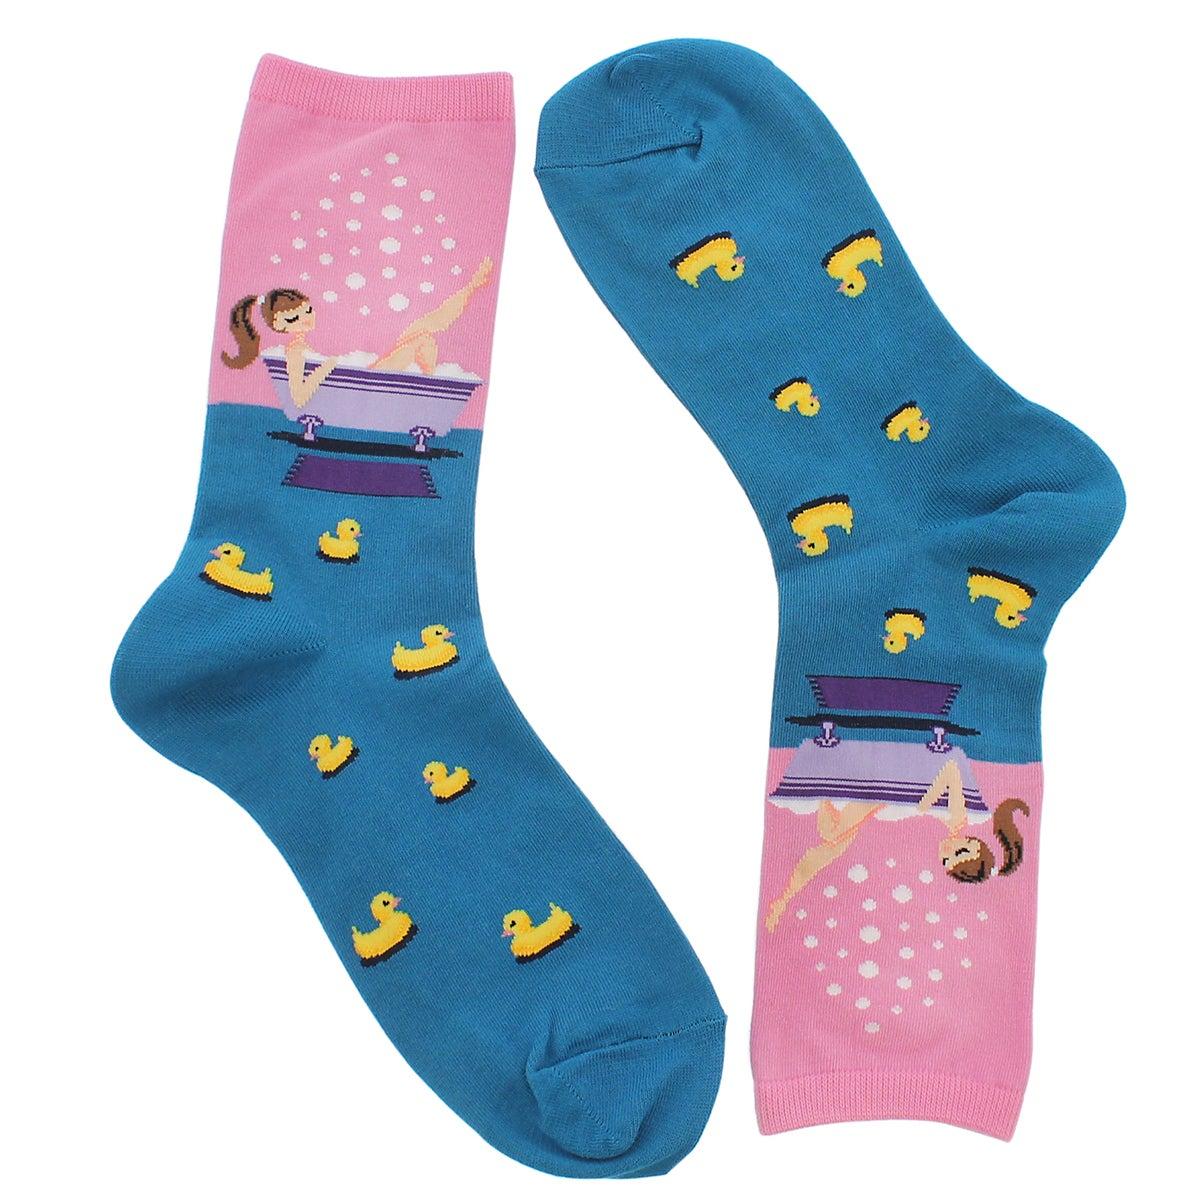 Lds Bathtime pink printed sock